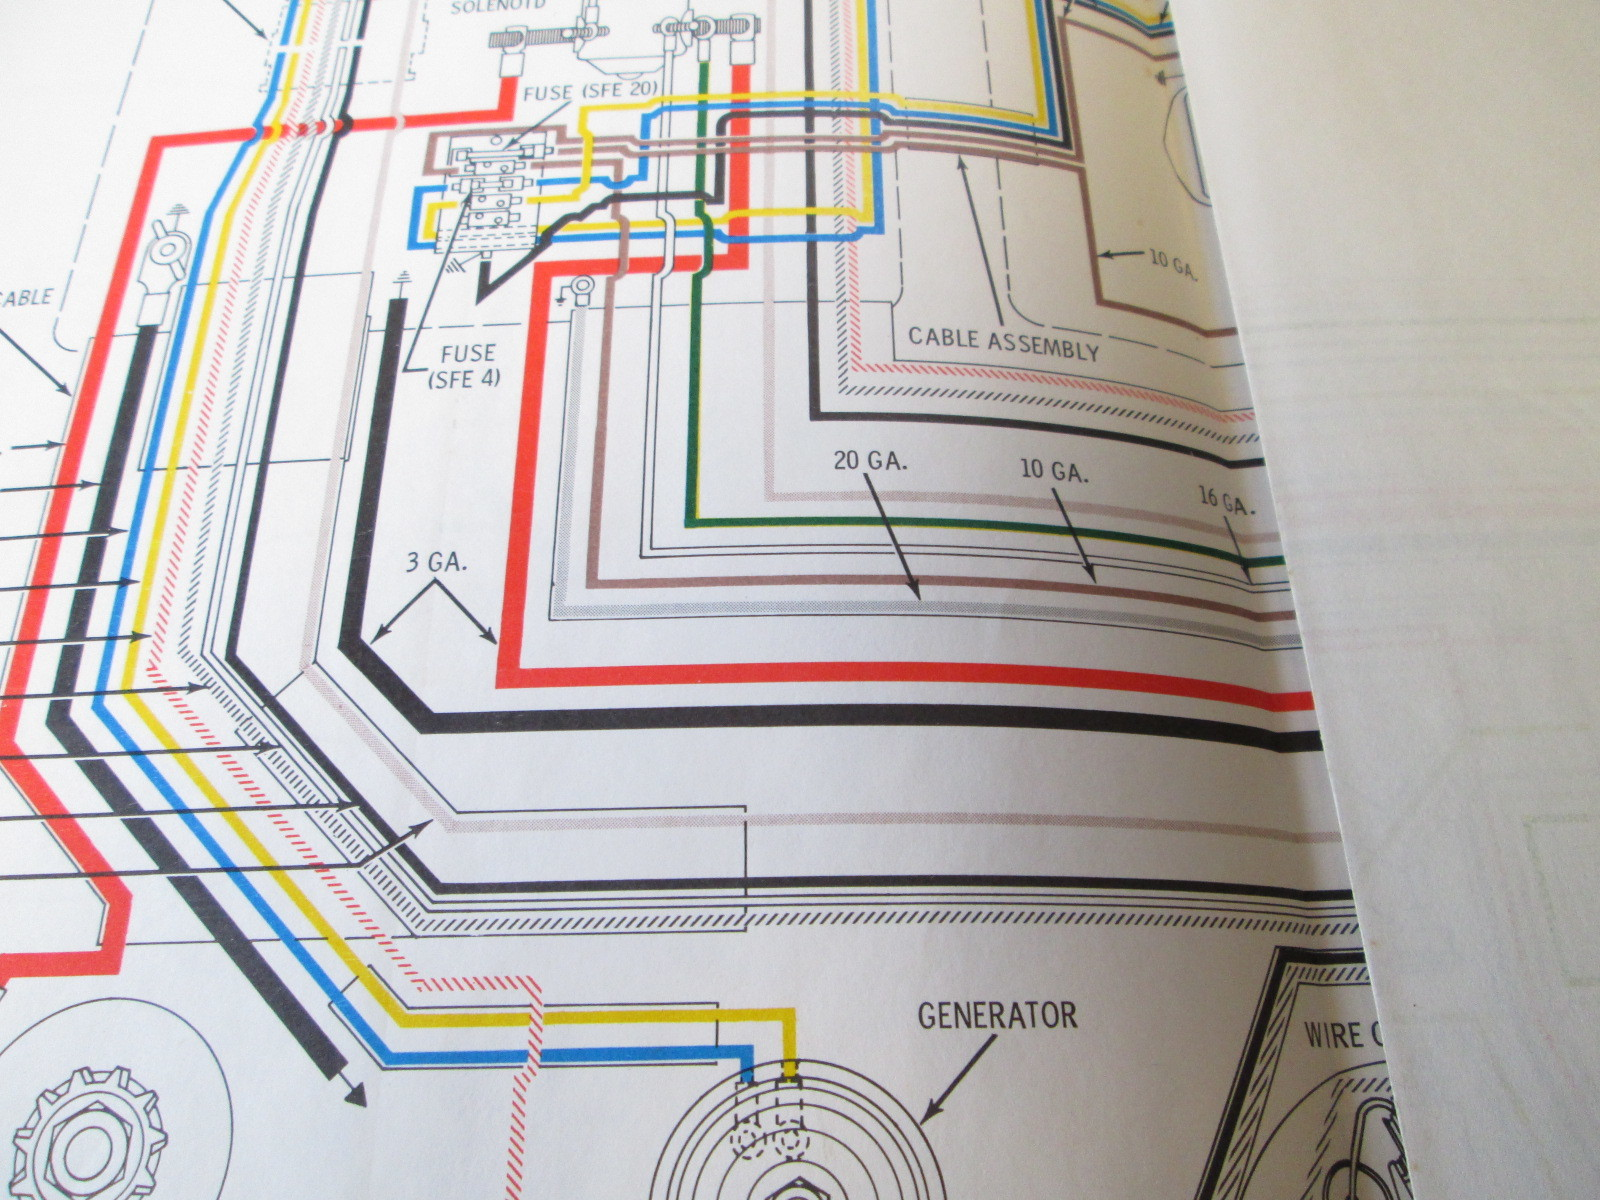 [WRG-5461] 115 Yamaha Outboard Gauge Wiring Diagram Free